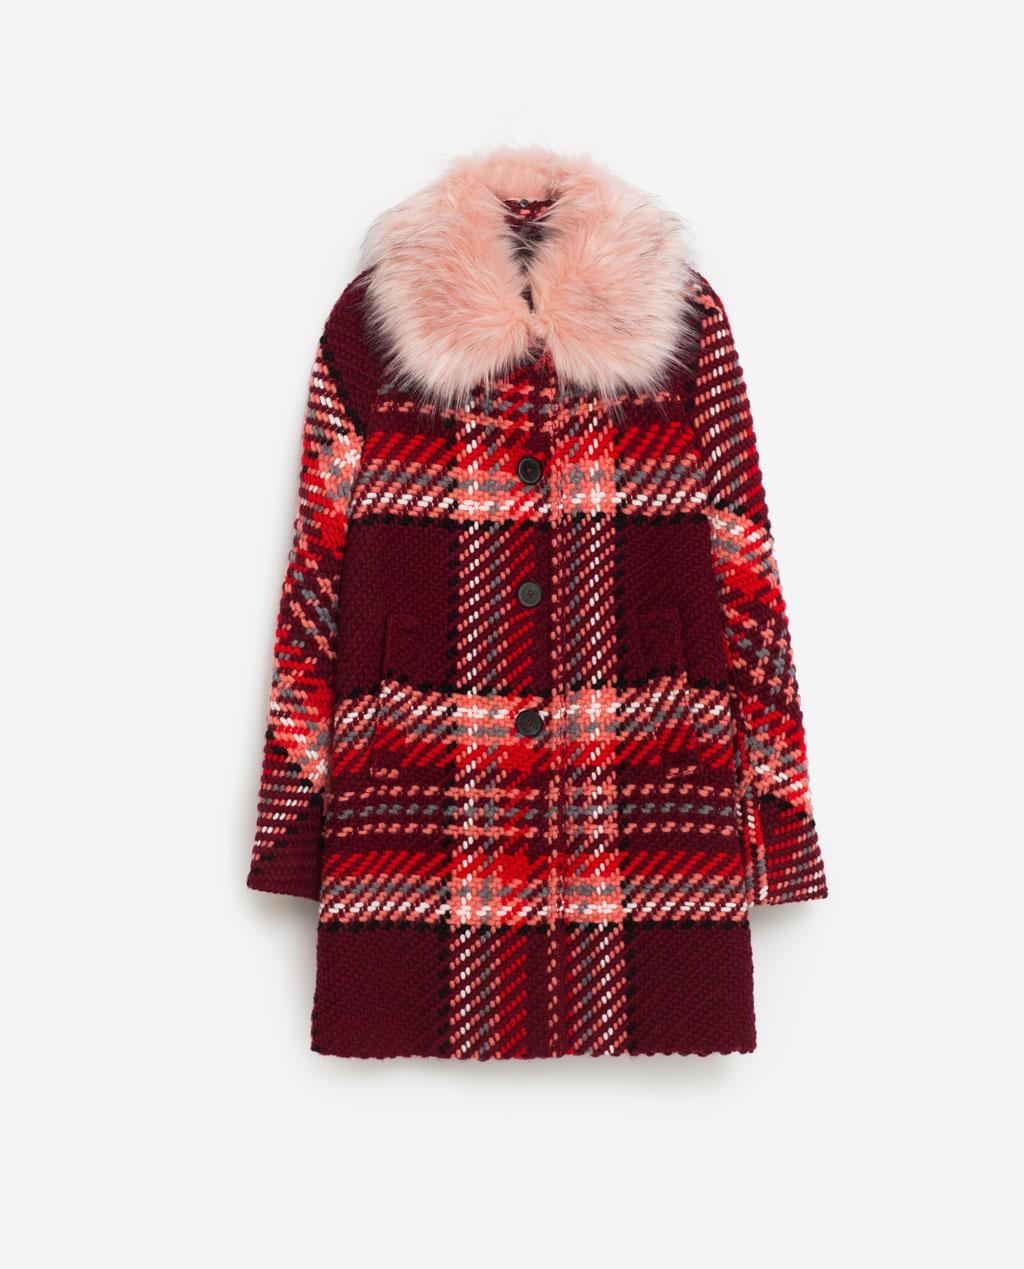 Zara Check Statement Coat